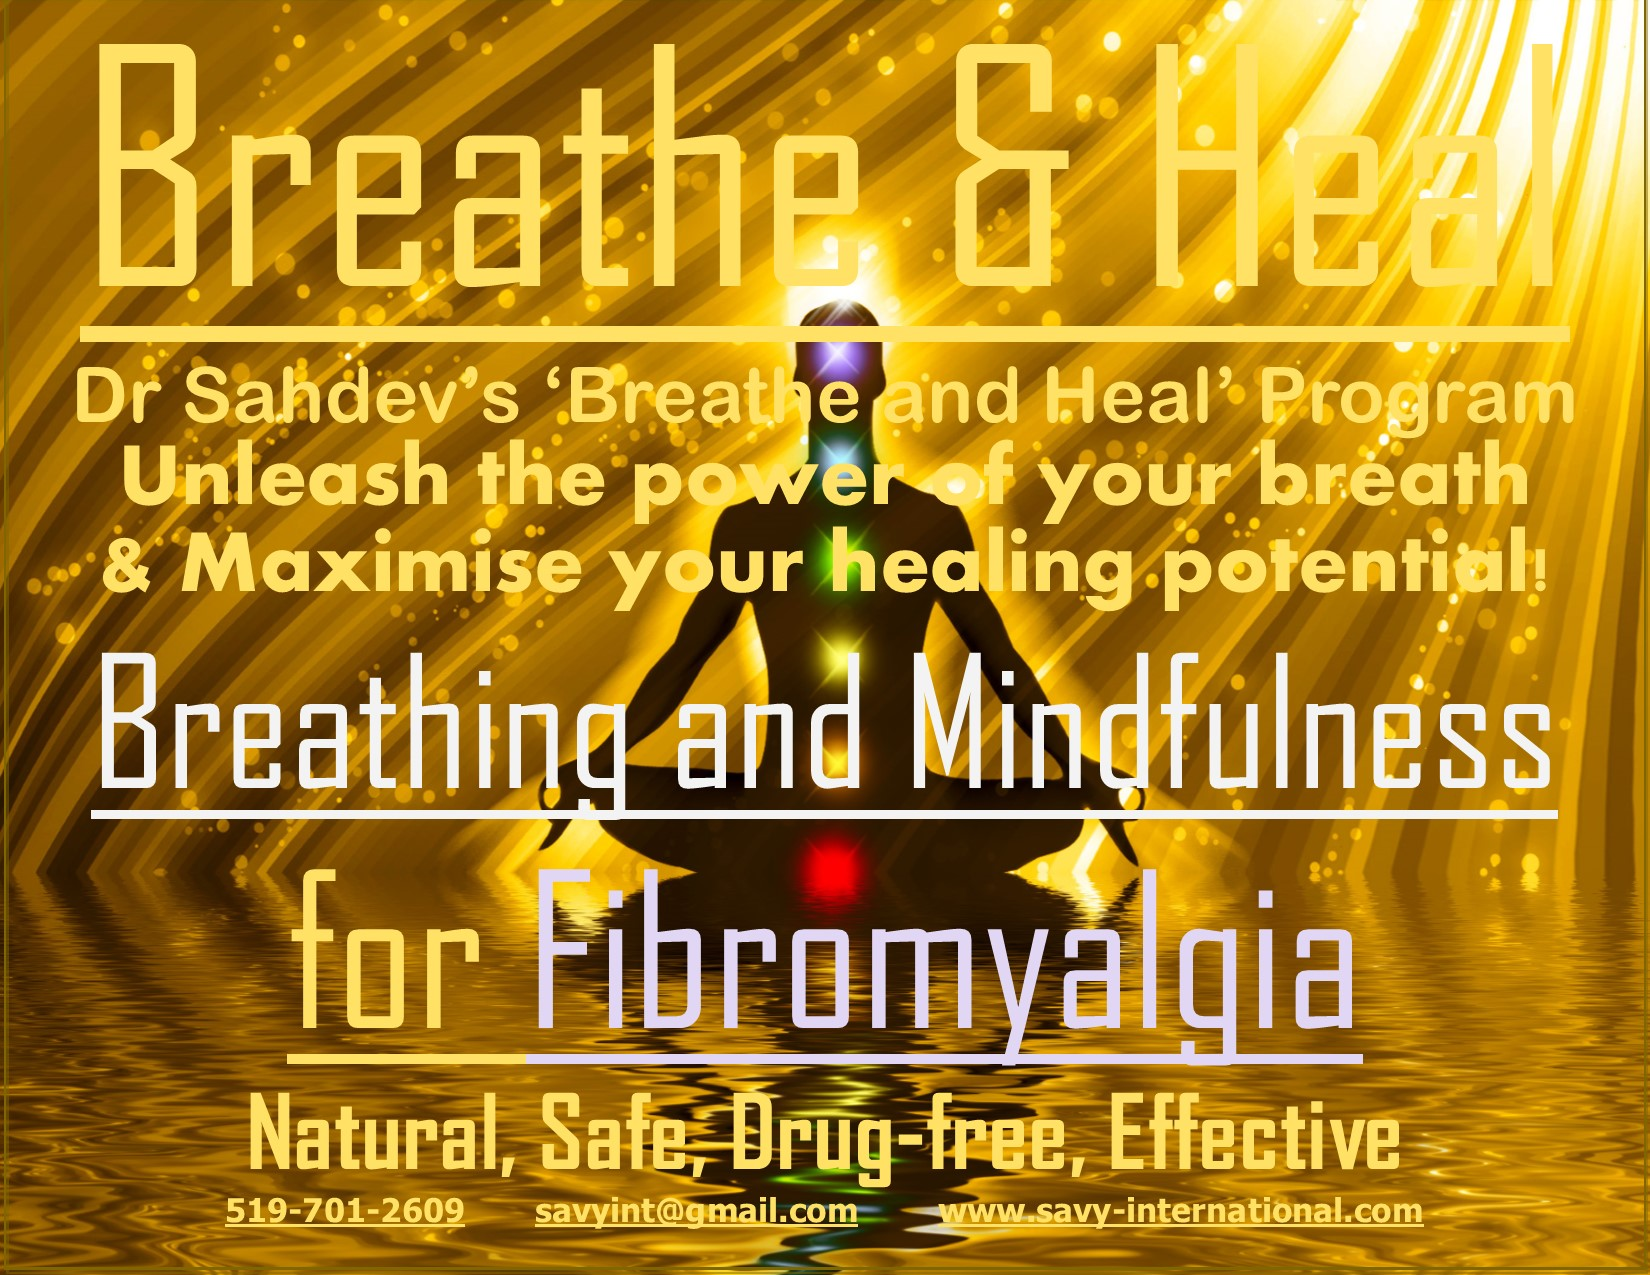 Breathing and Mindfulness in Fibromyalgia